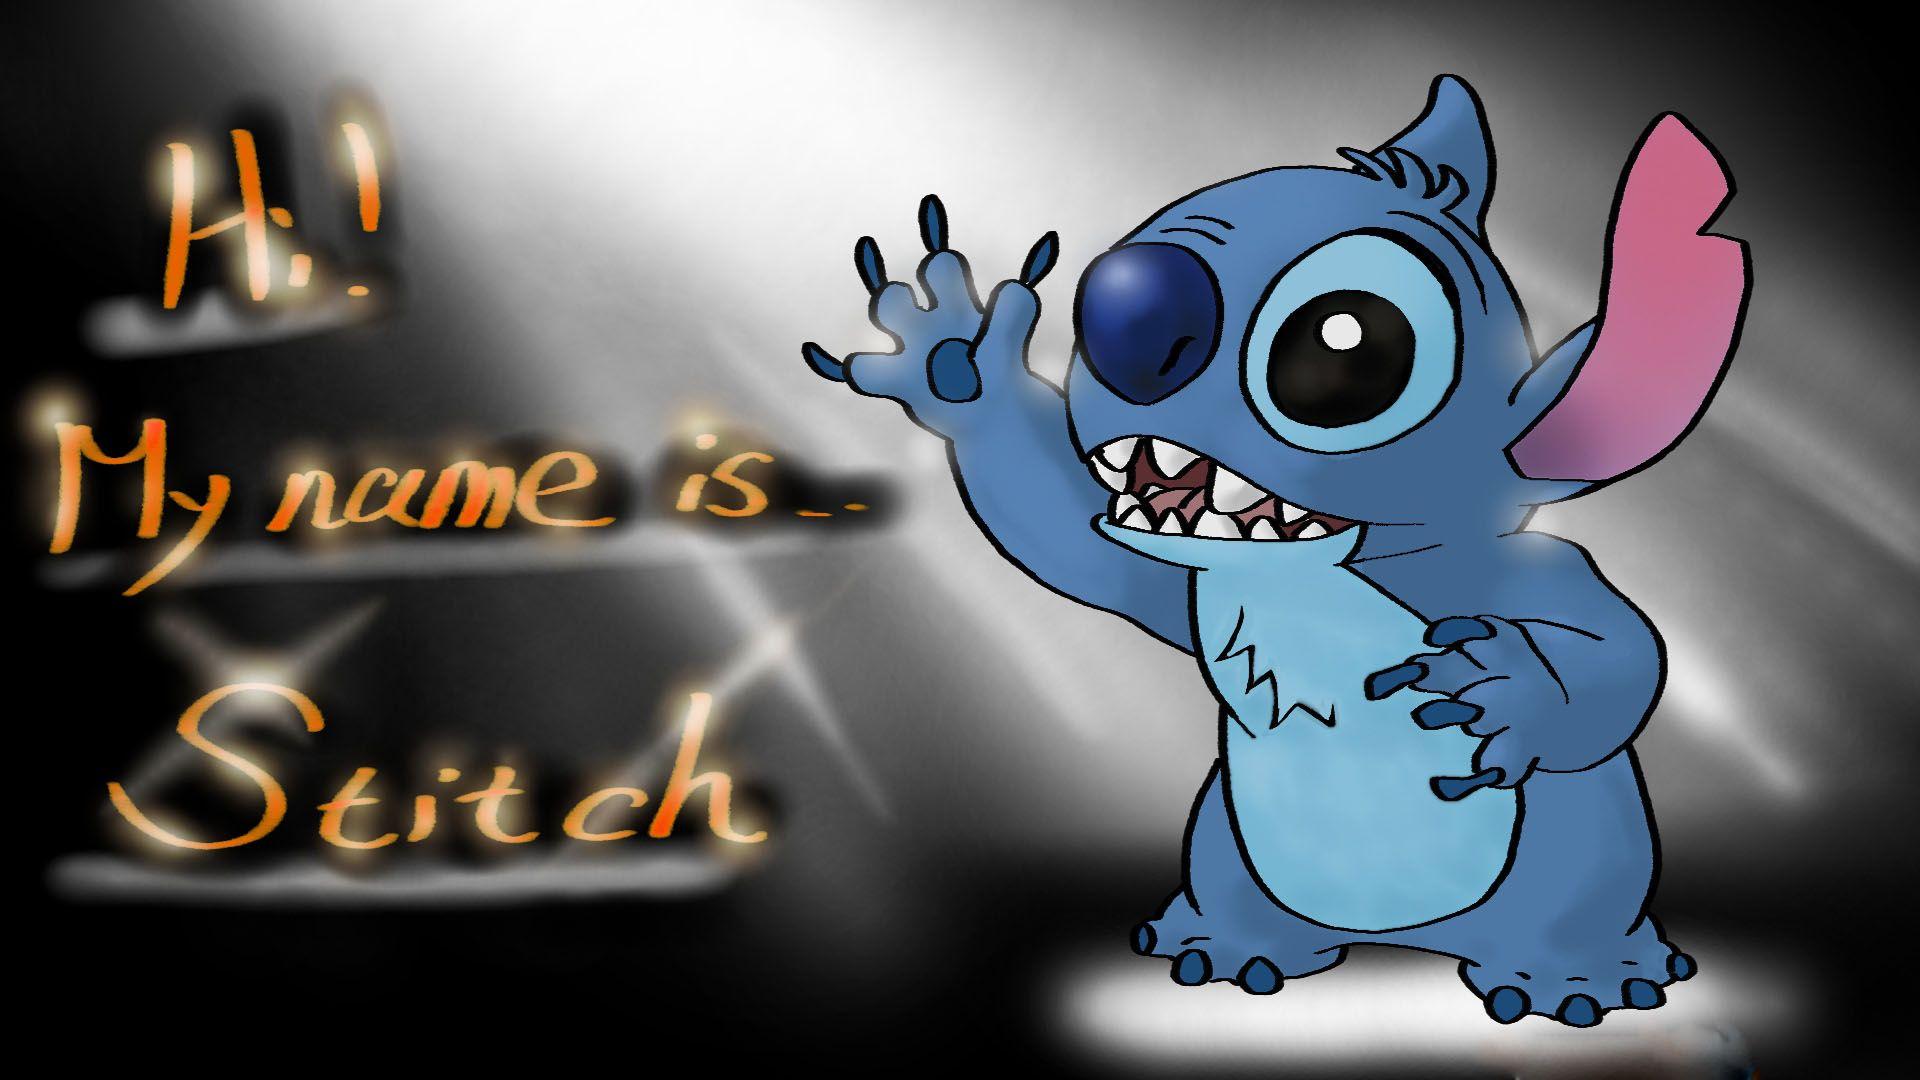 Hi Stitch lilo and stitch Wallpapers HD. Lilo and stitch